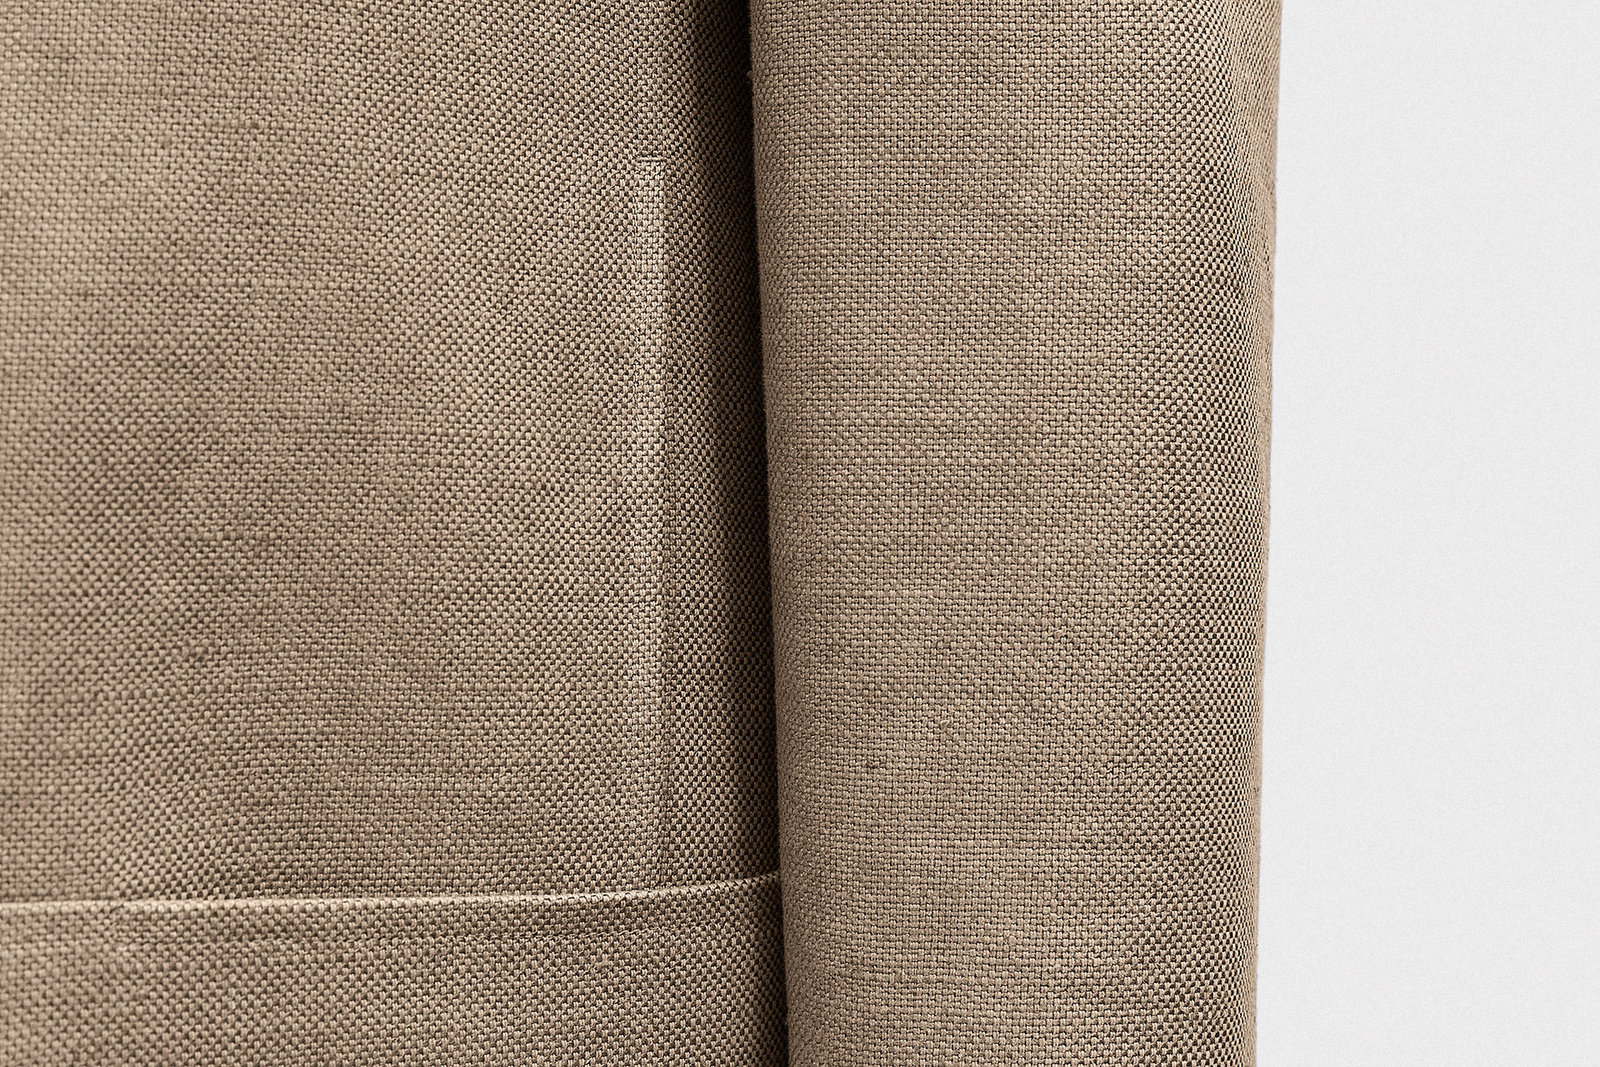 shopcoat-cotton-linen-hopsack-malt-8@2x.jpg